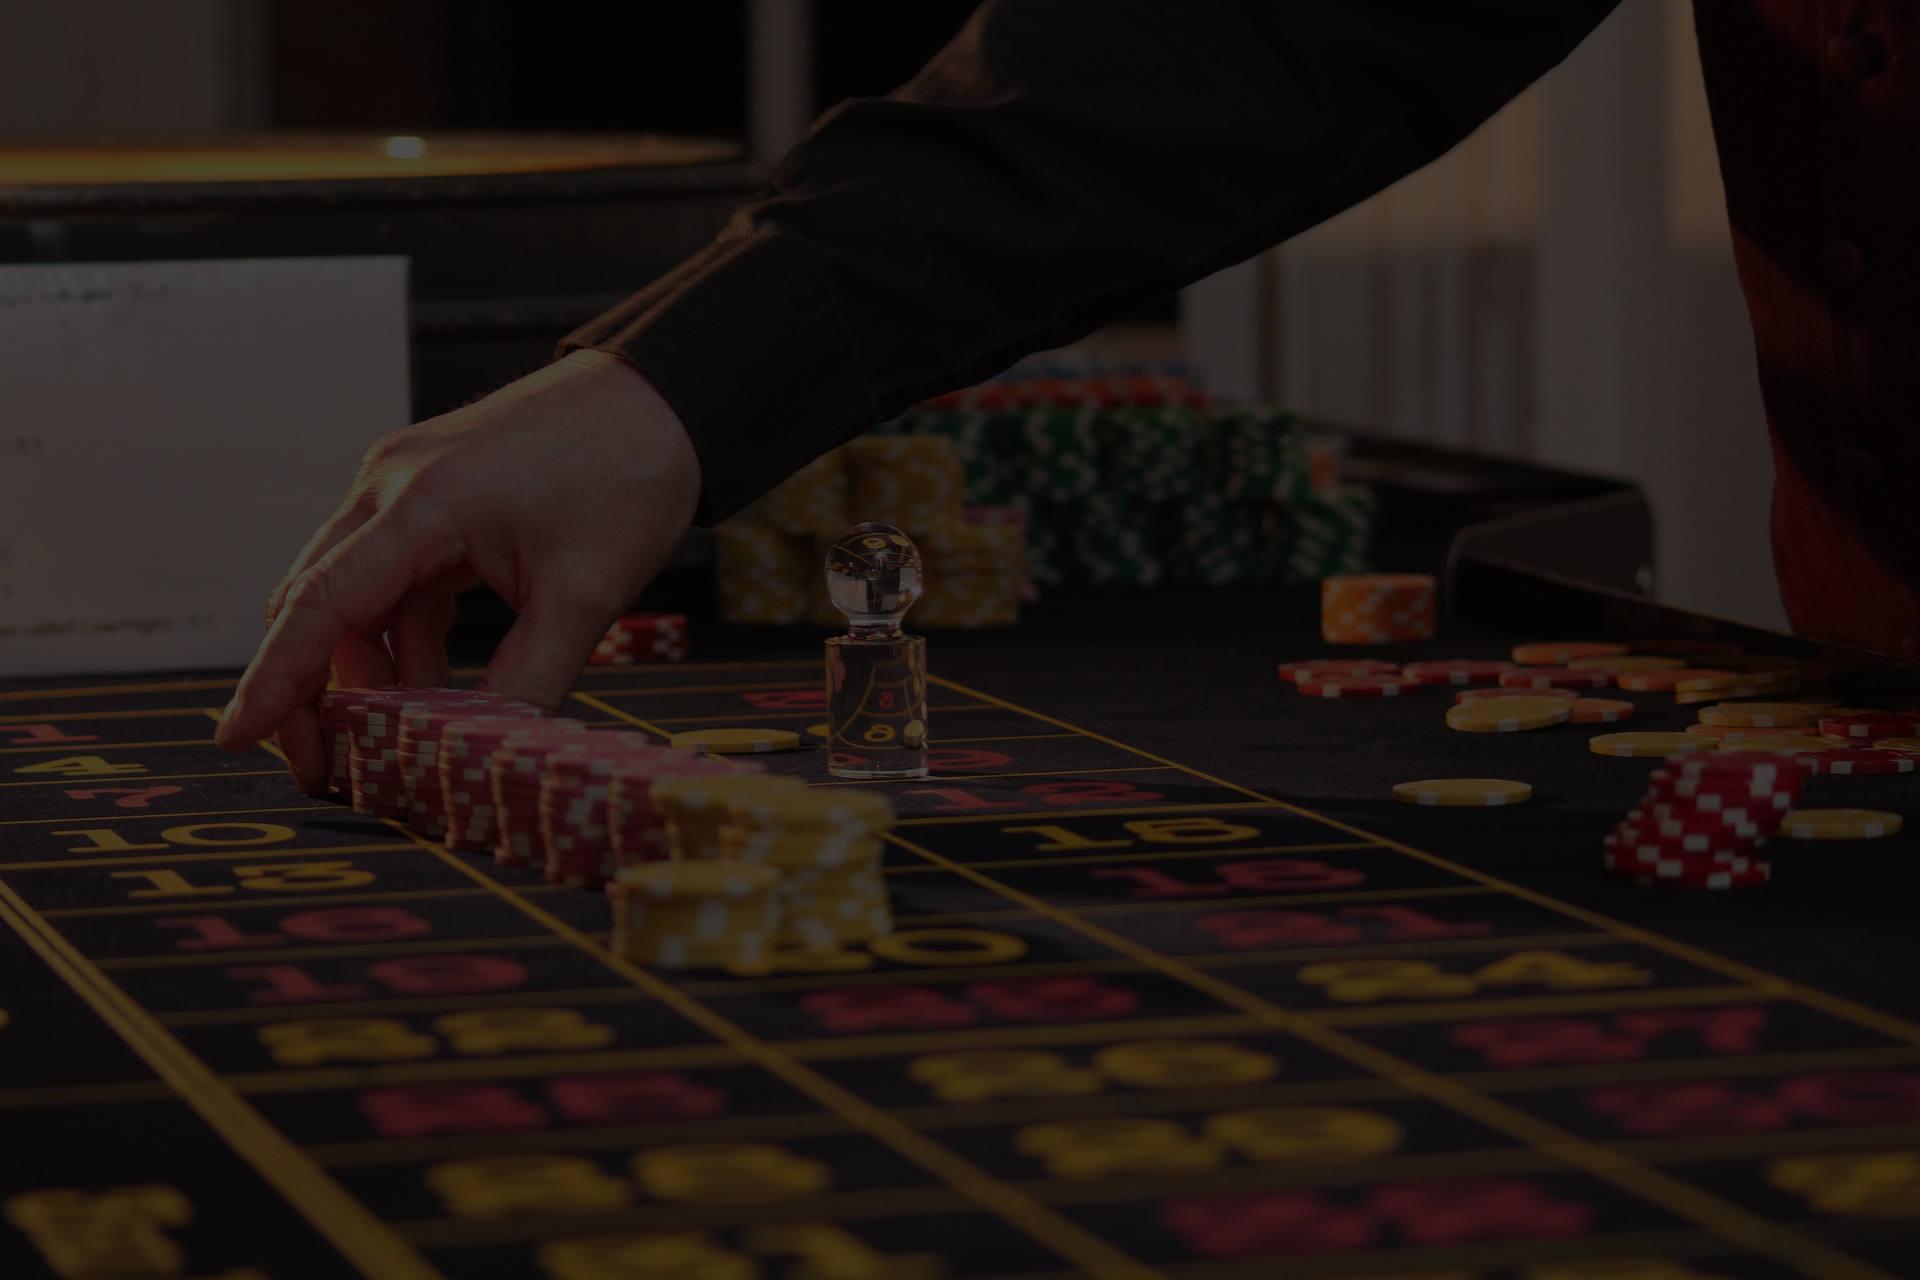 Play texas holdem online free multiplayer